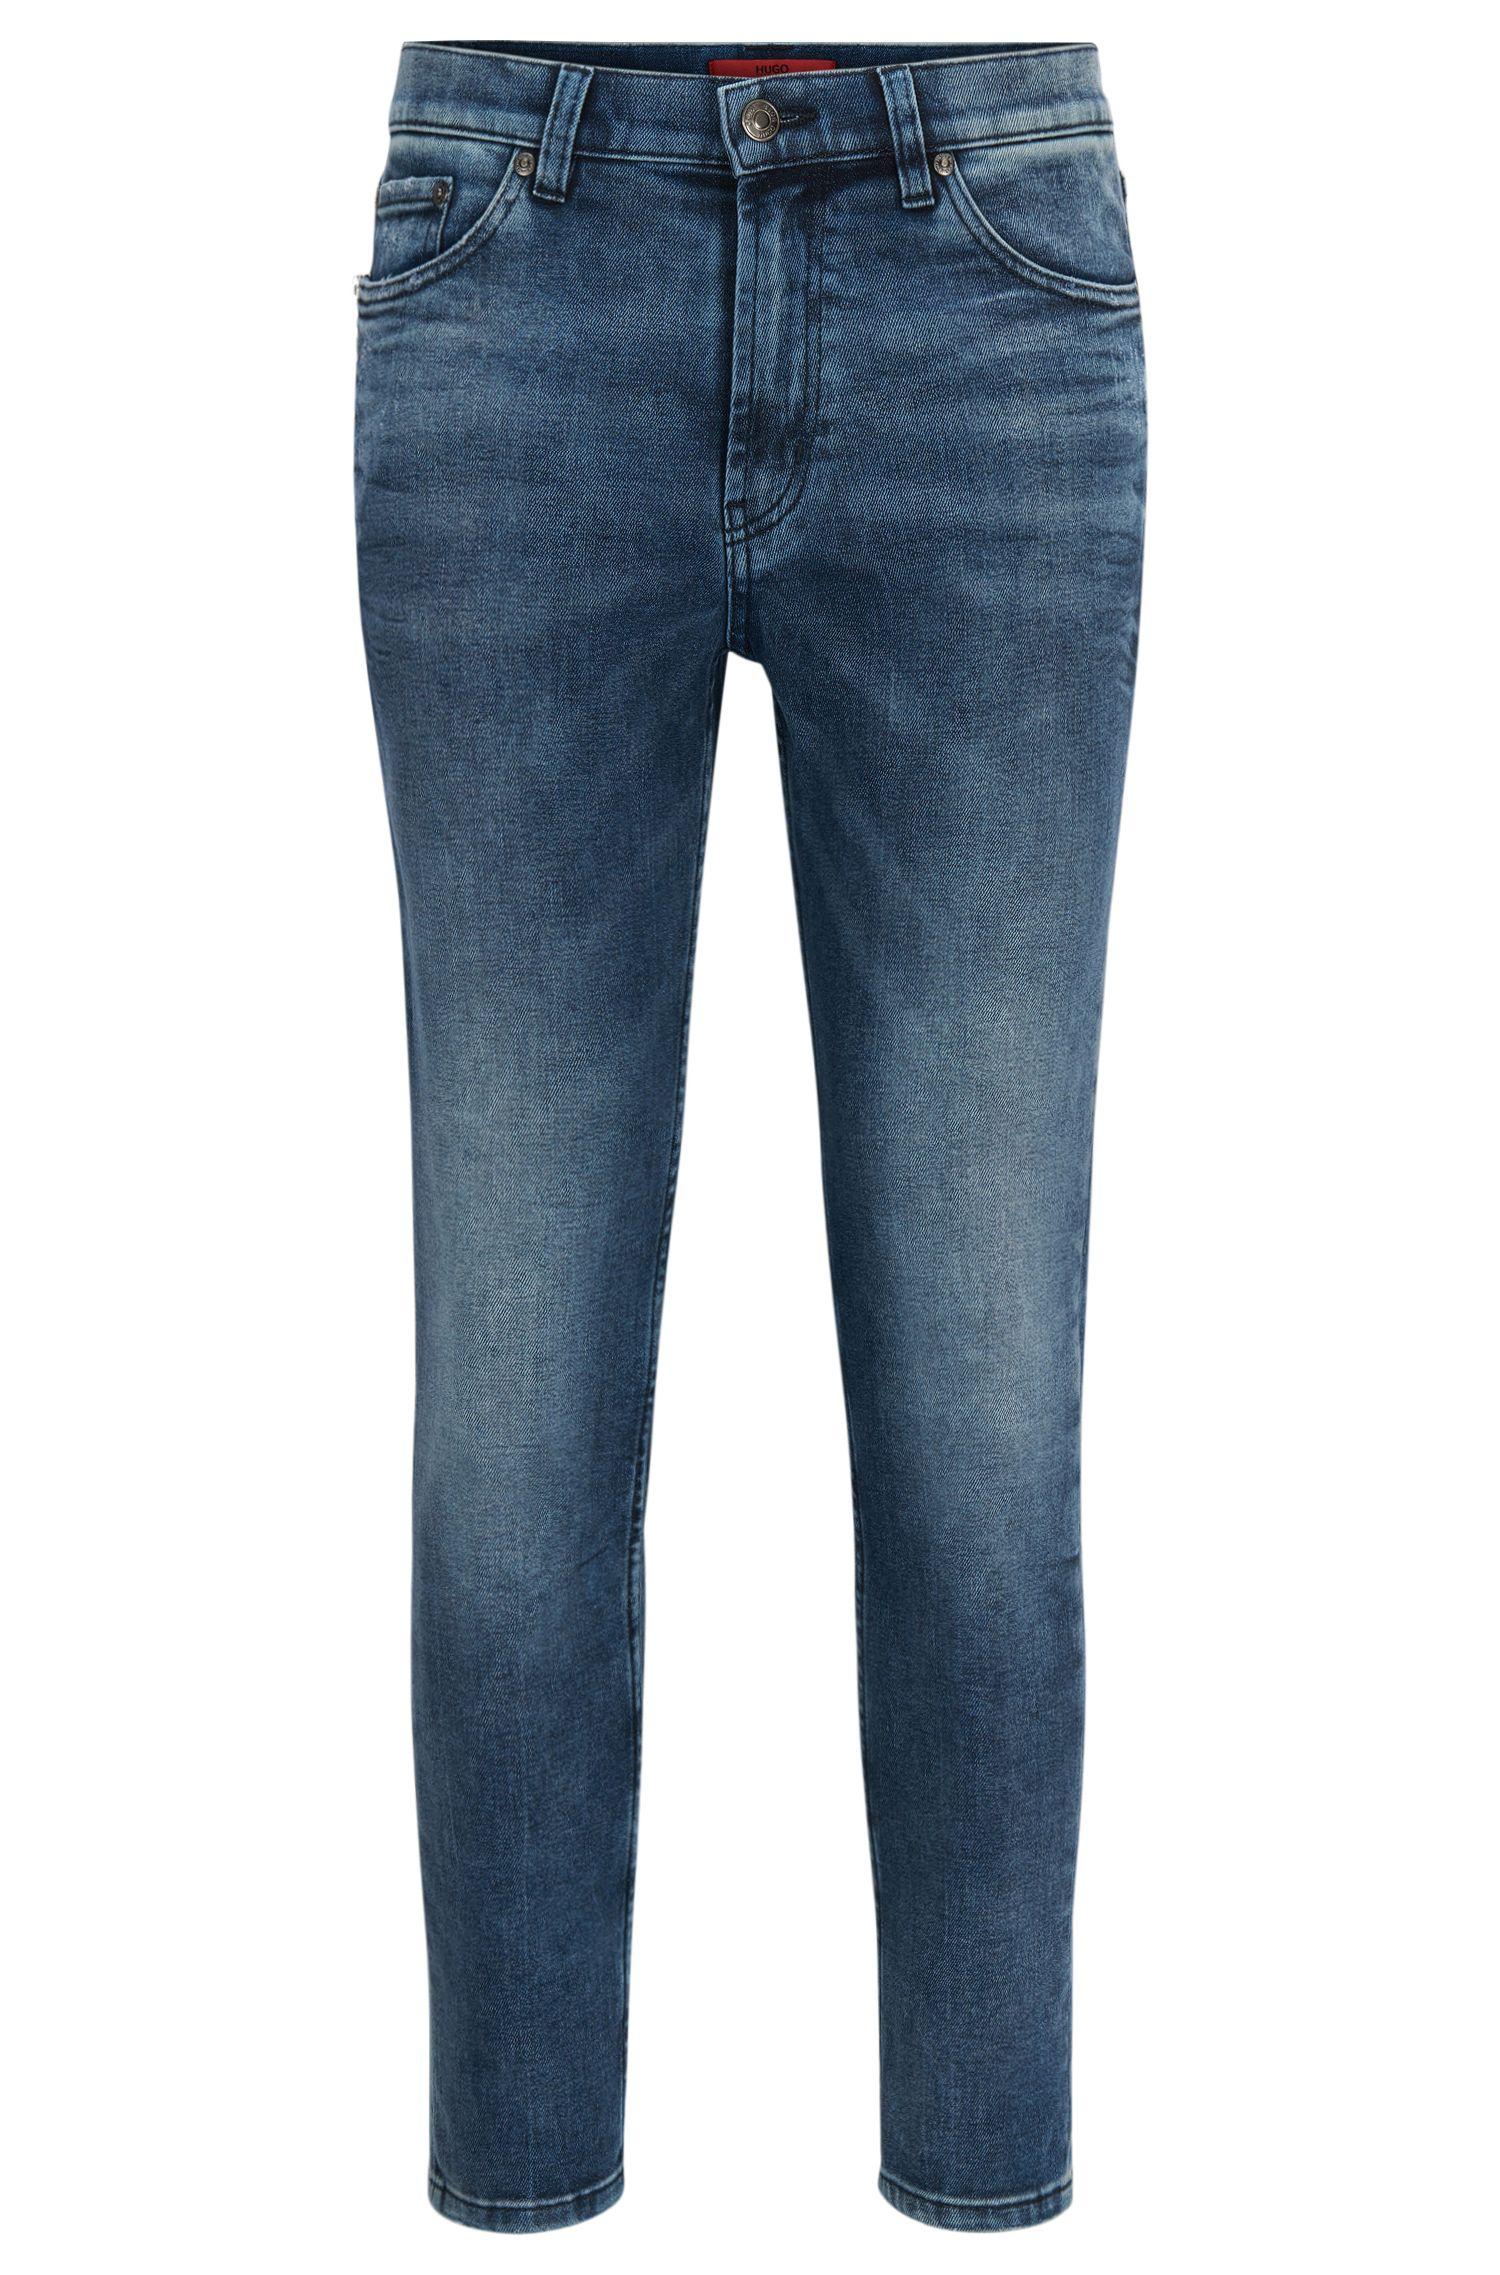 11.5 oz Stretch Cotton Jeans, Slim Fit | Hugo 332